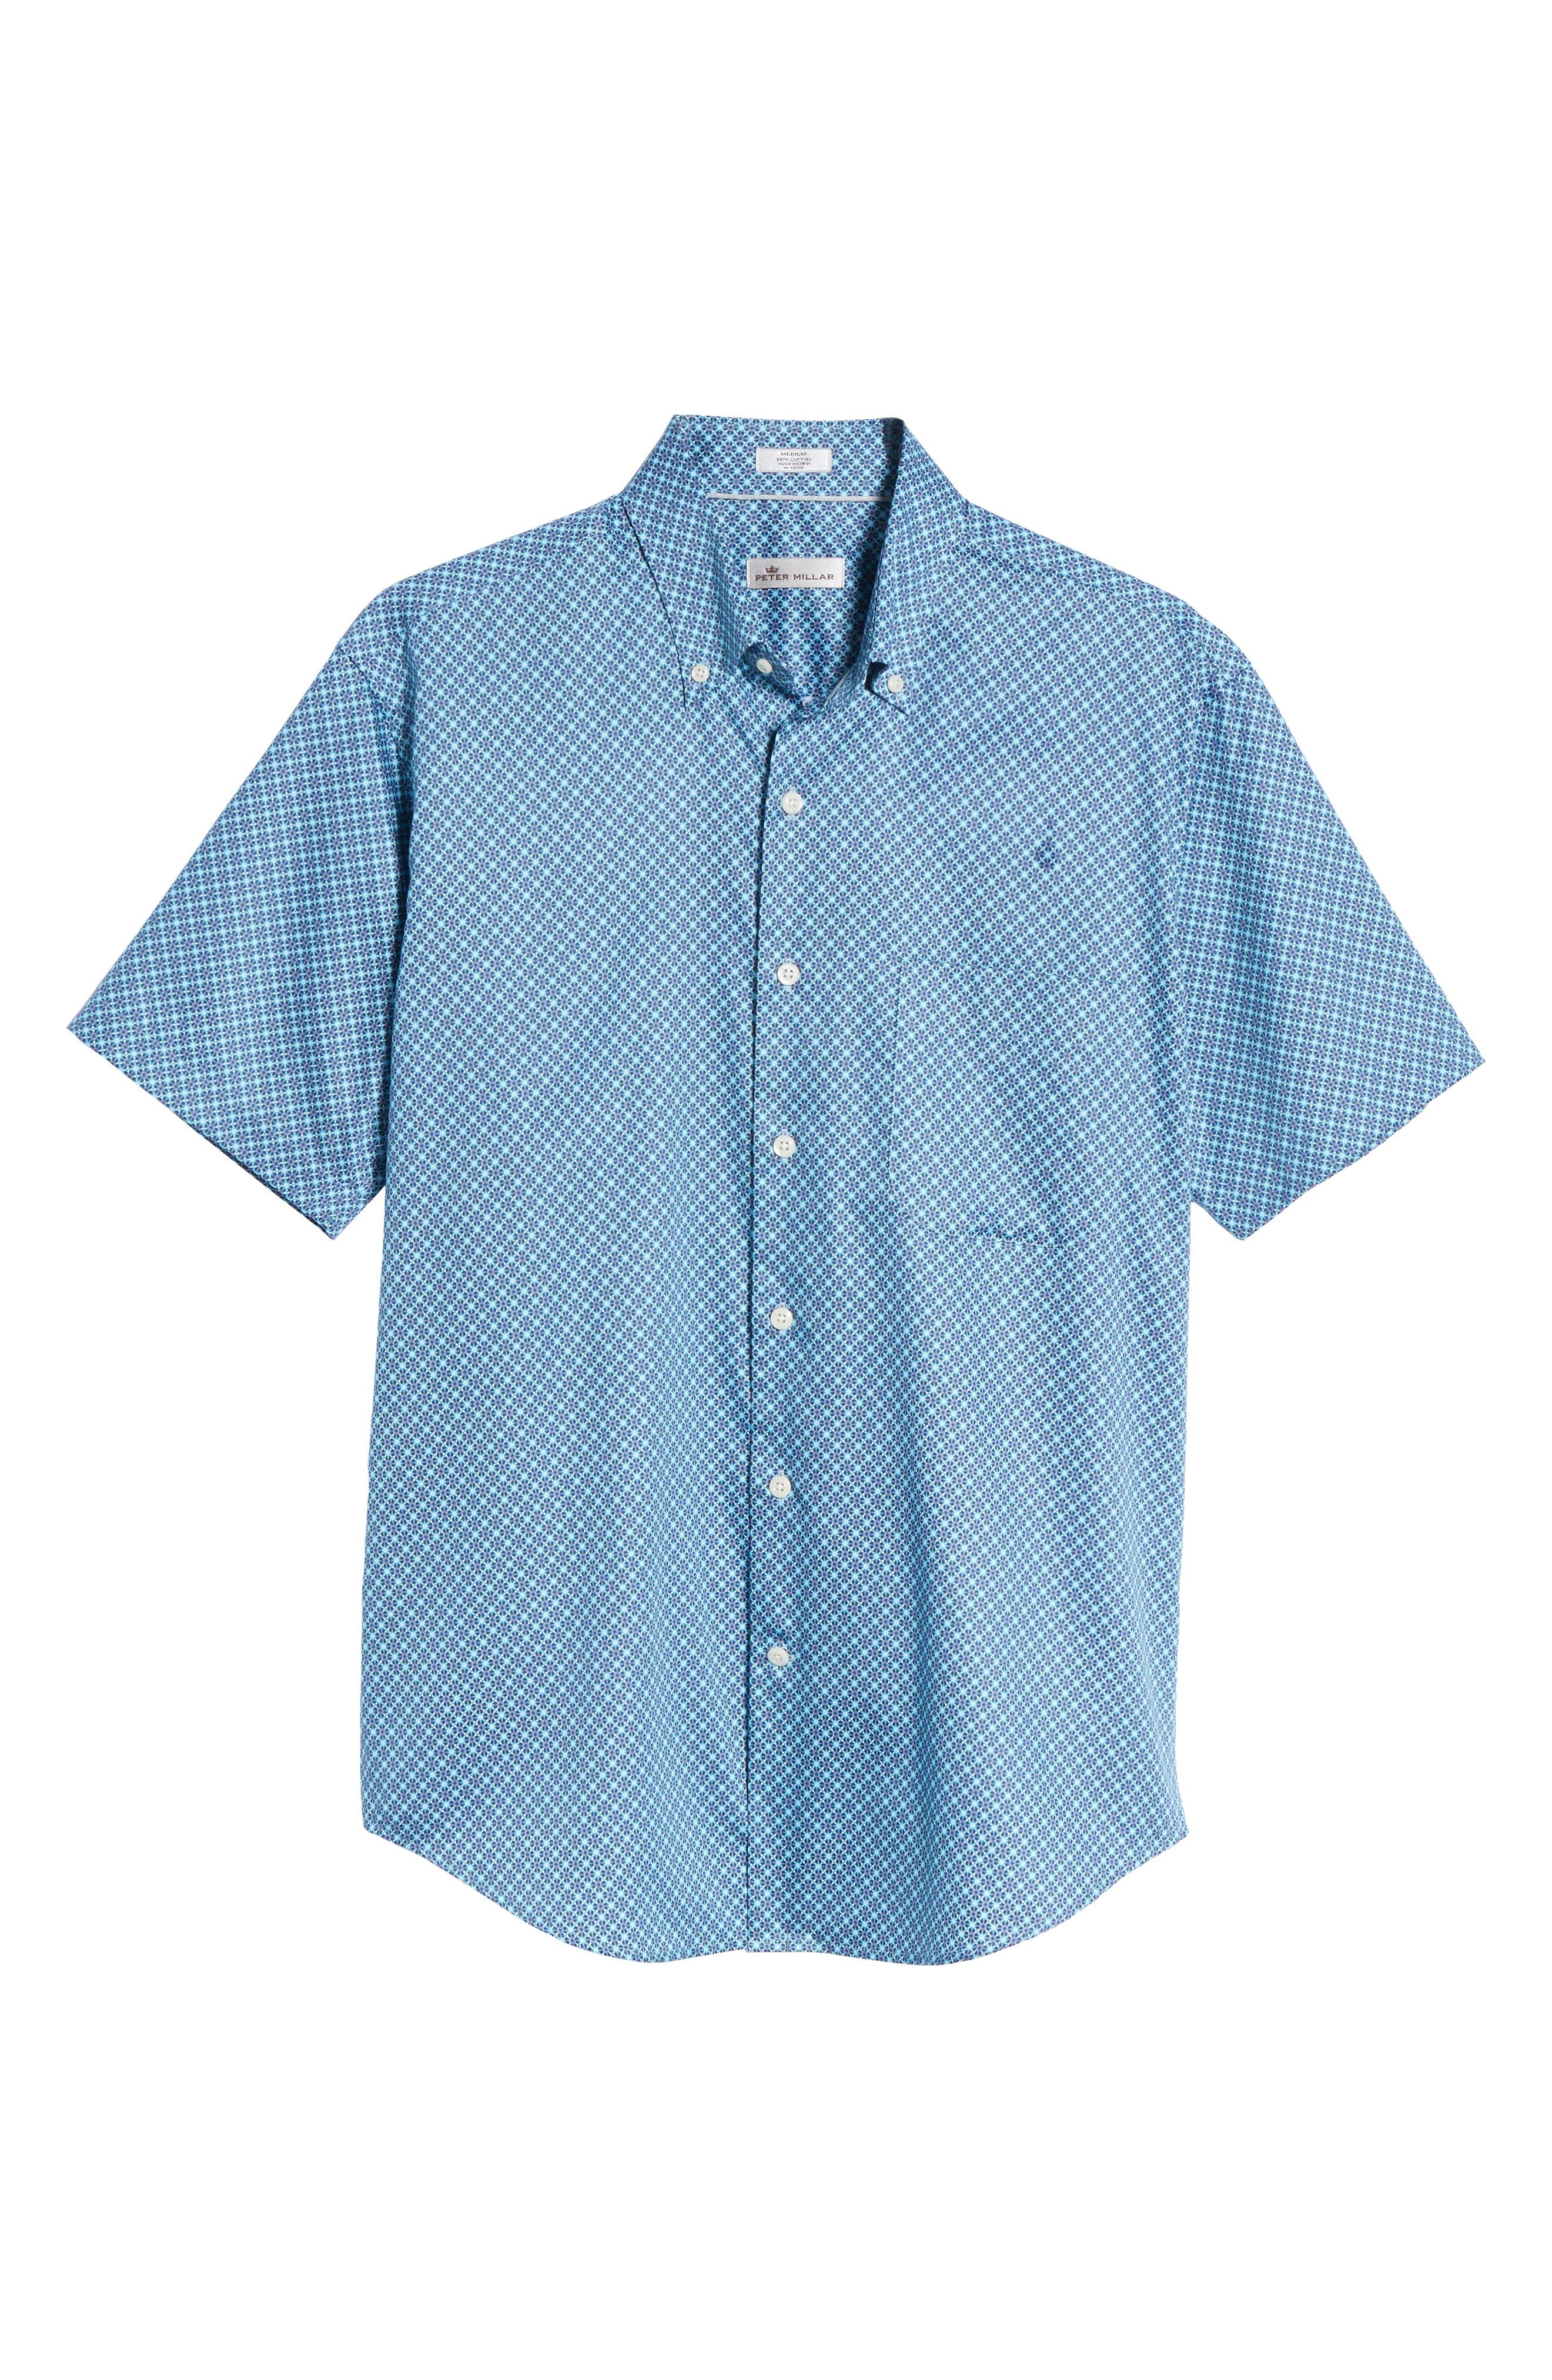 Get Kracken Sport Shirt,                             Alternate thumbnail 6, color,                             424